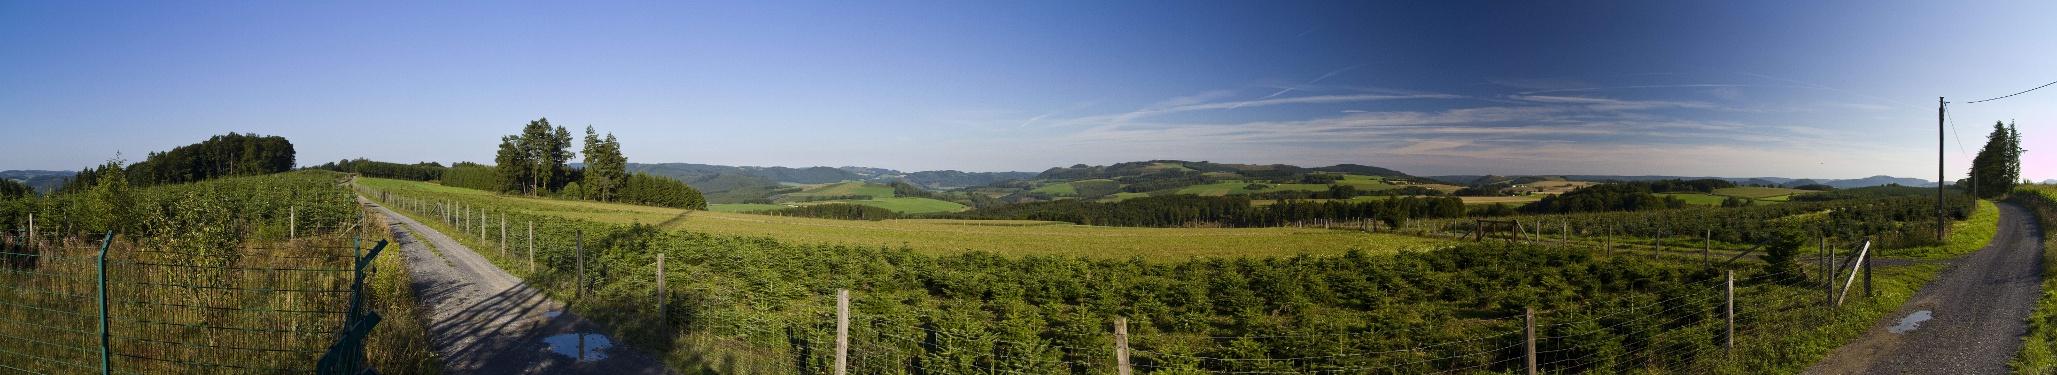 Panoramablick auf dem Reister Berg